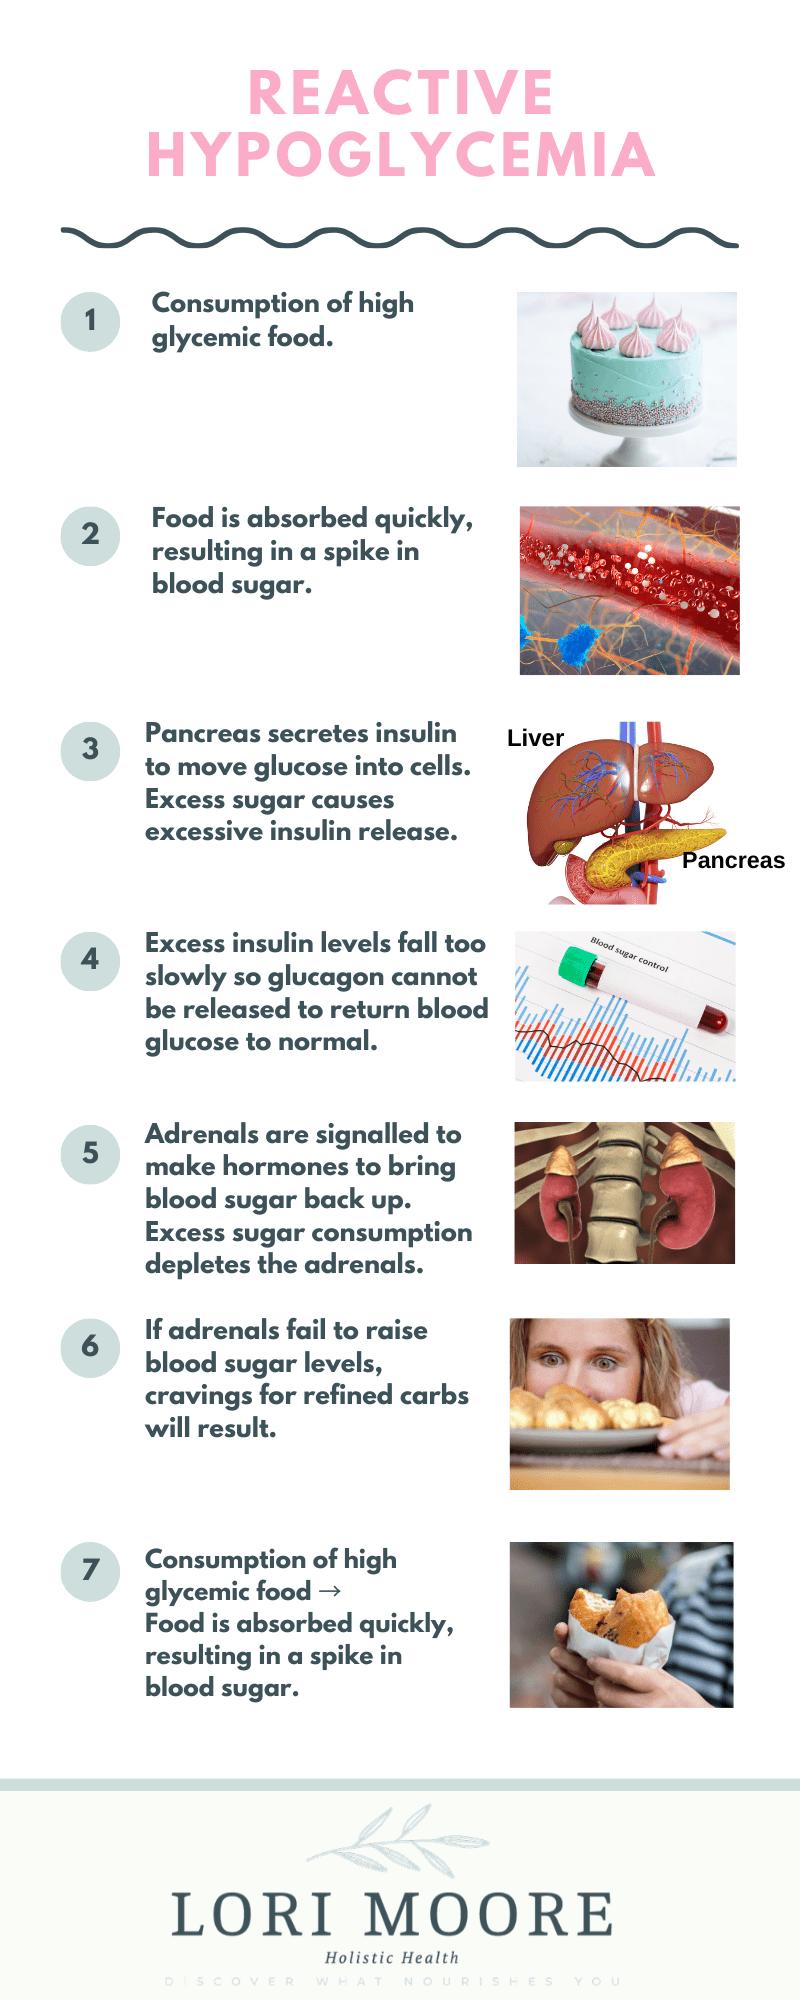 Reactive Hypoglycemia infographic